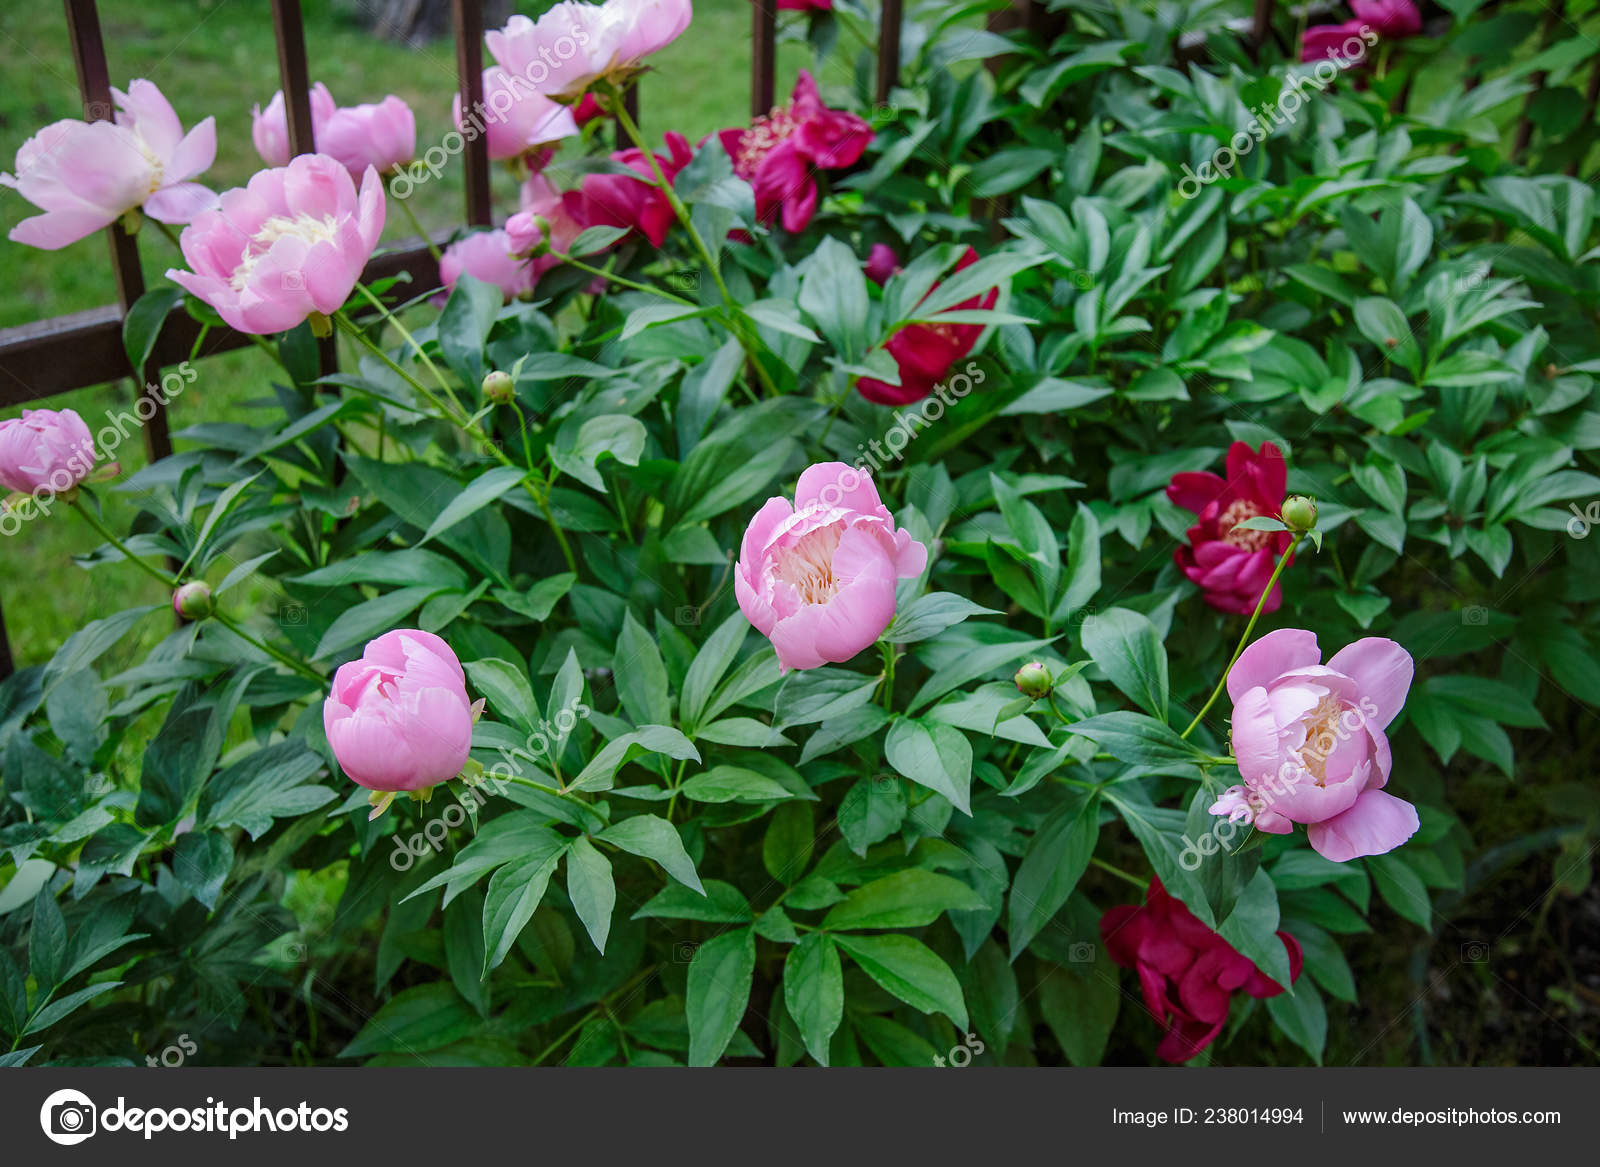 Shrubs Beautiful Peonies Garden Growing Flowers Sunny Day Garden